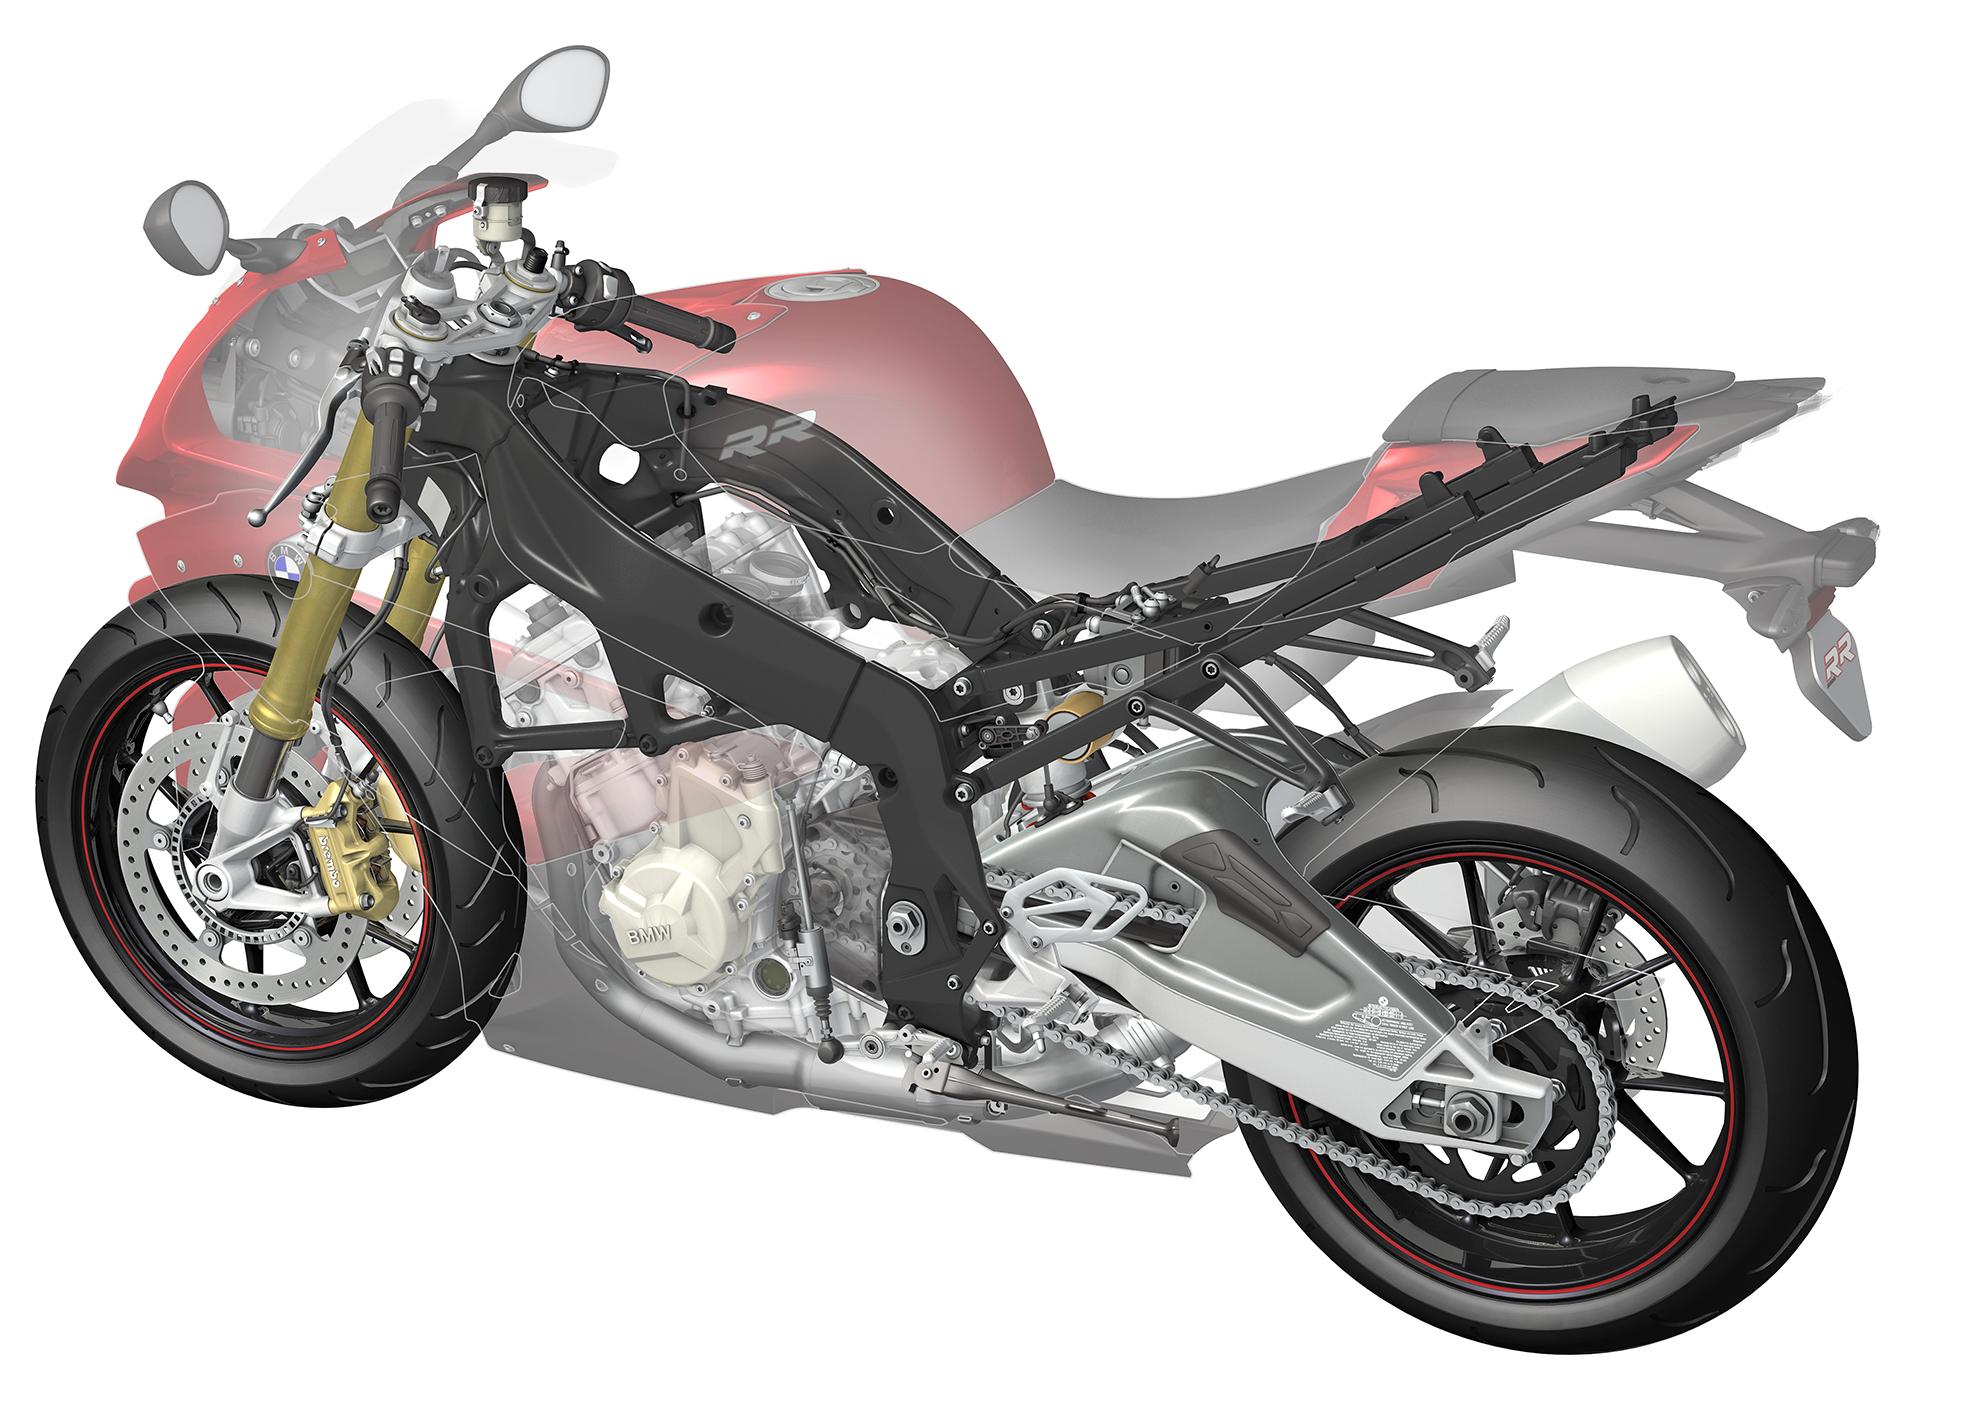 2013 Bmw S1000rr Wiring Diagram Circuit And Hub First Ride Review Visordown Rh Com 2014